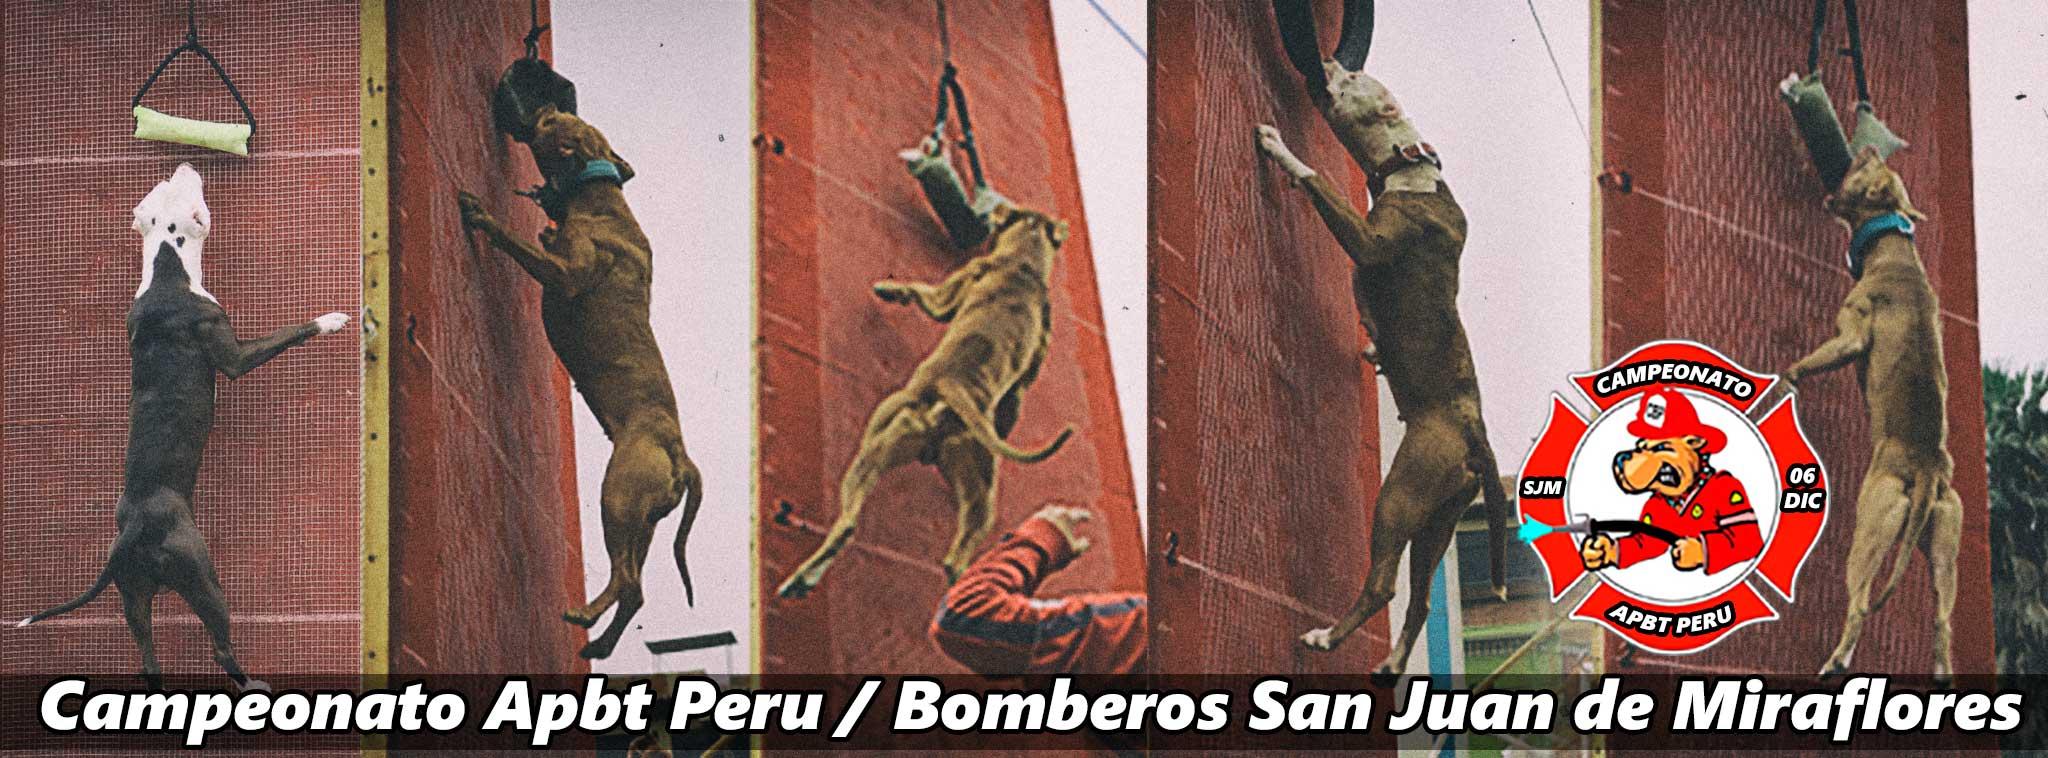 Campeonato Apbt Peru / Bomberos San Juan de Miraflores